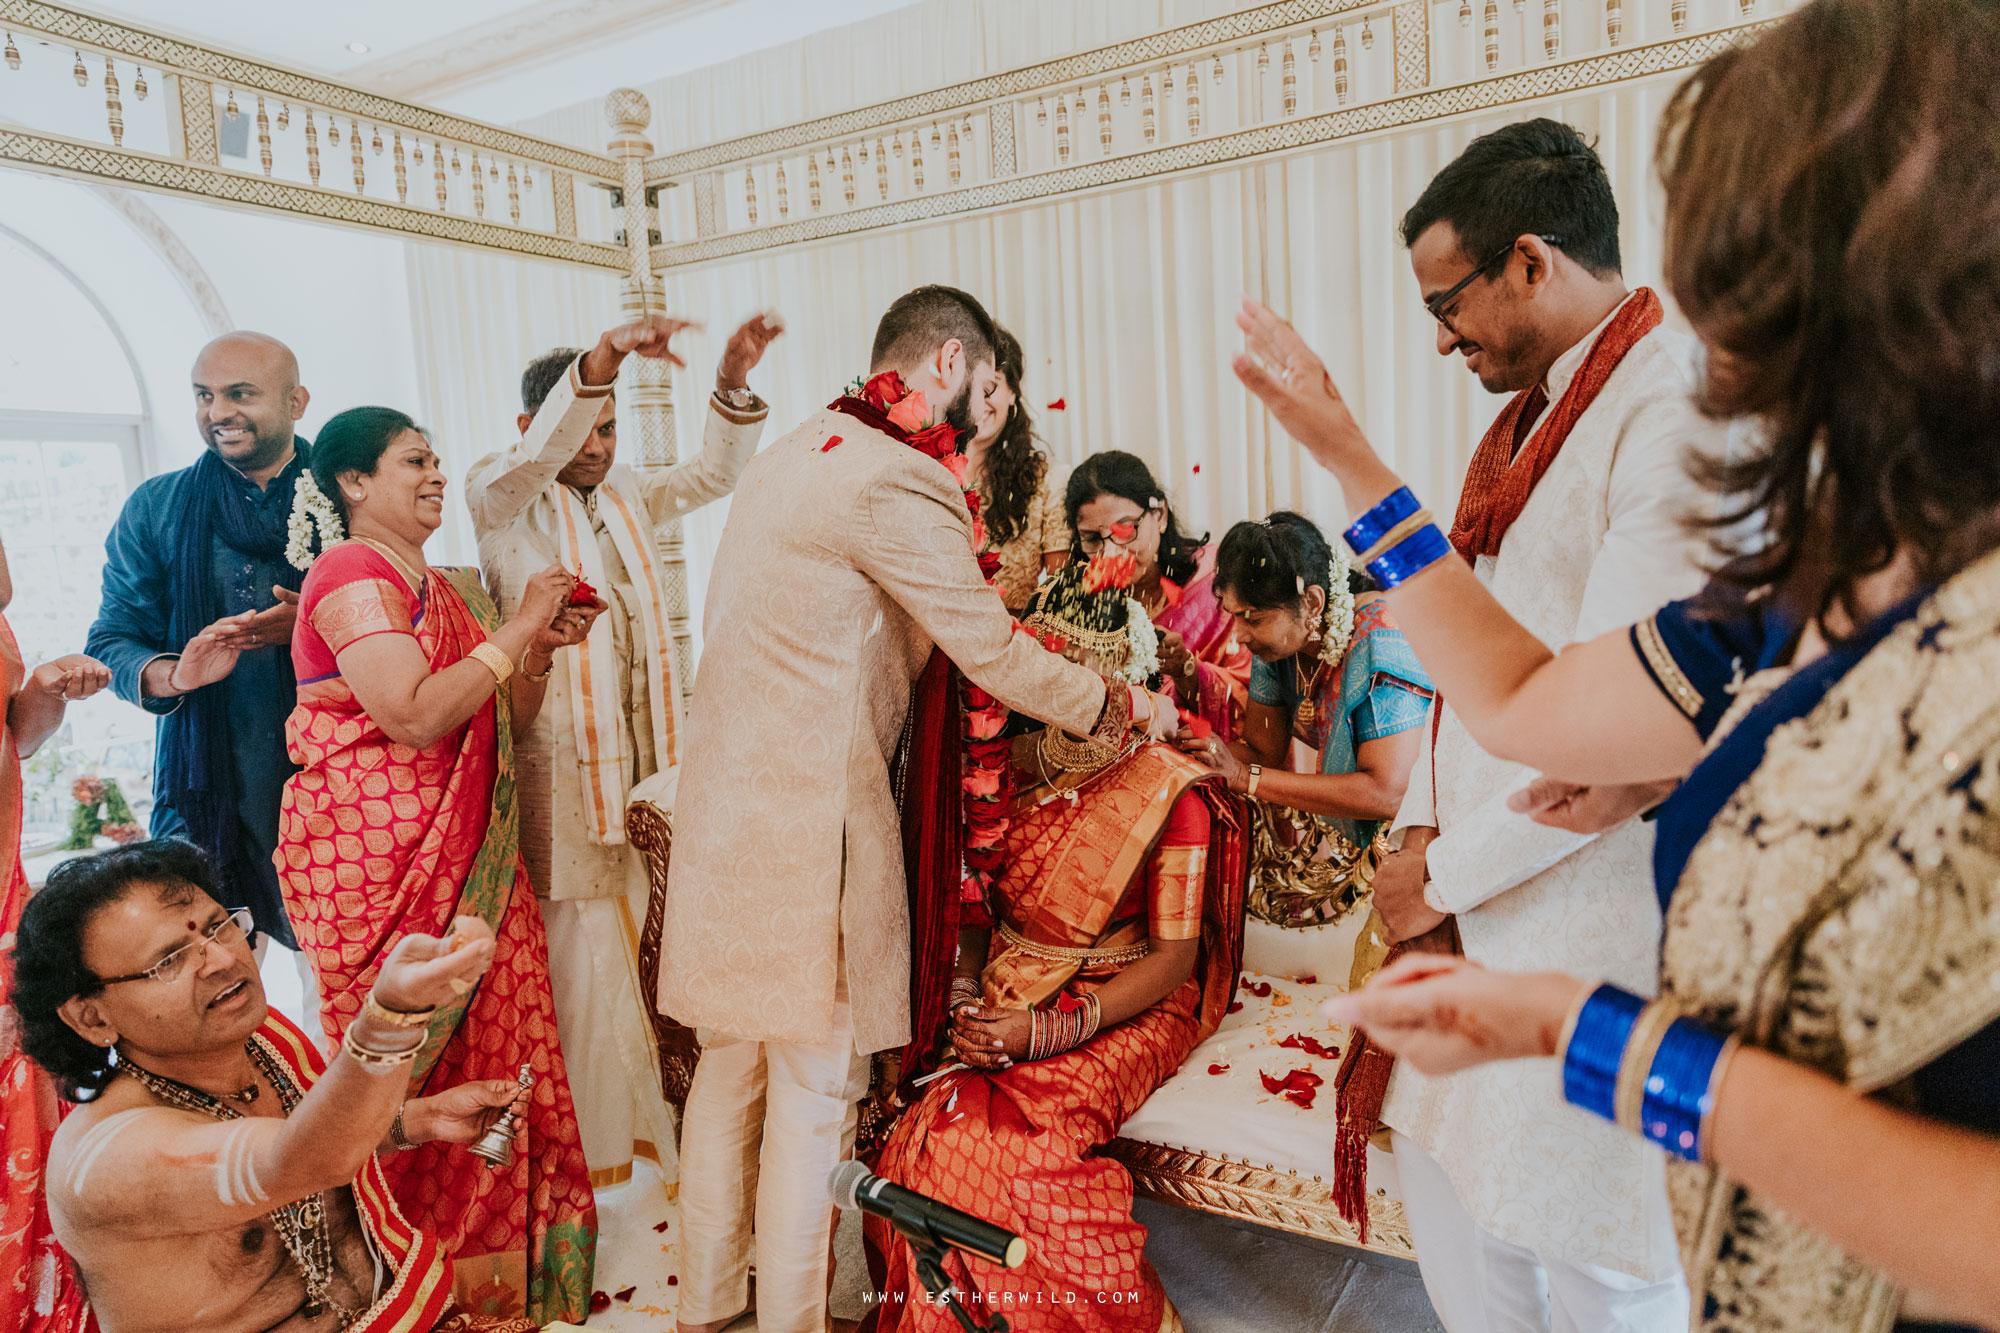 Northbrook_Park_Farnham_Surrey_London_Wedding_Hindu_Fusion_Esther_Wild_Photographer_IMG_4511.jpg